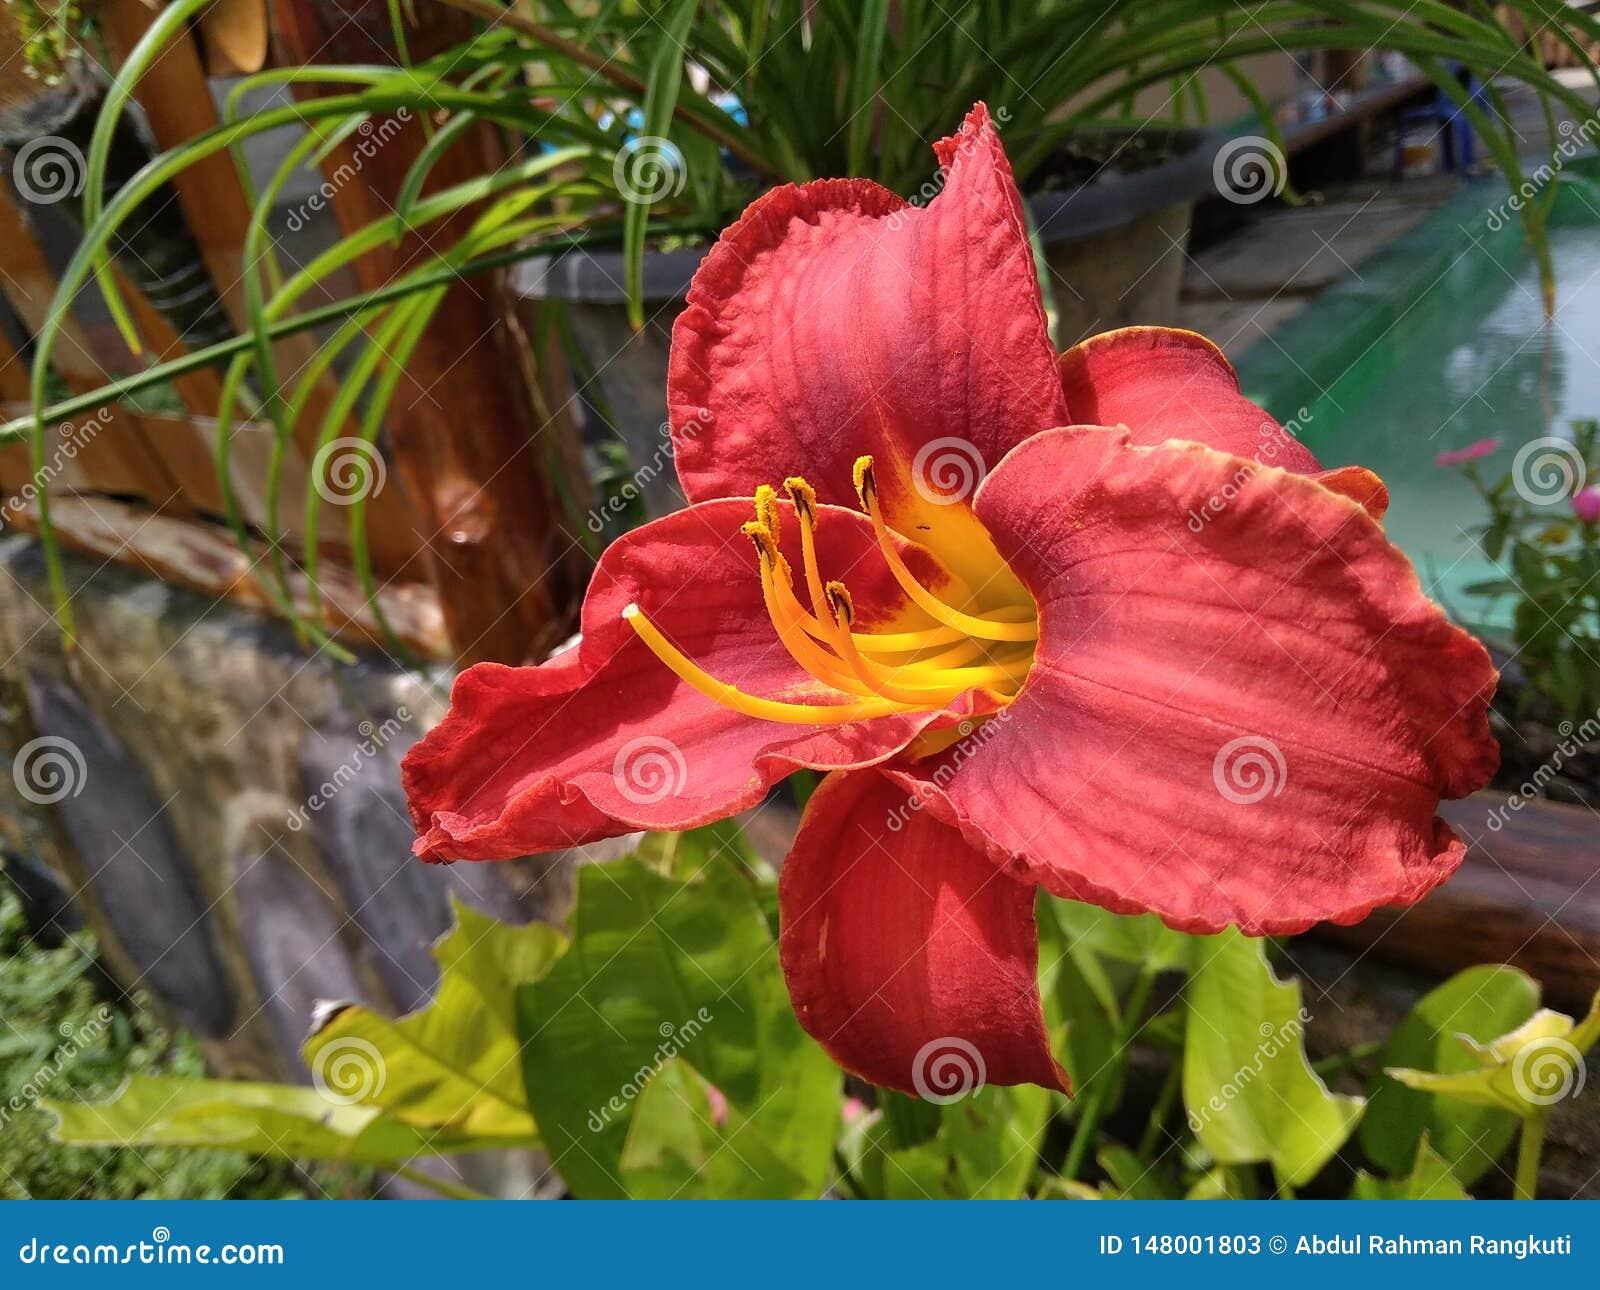 Red Amaryllis Flower